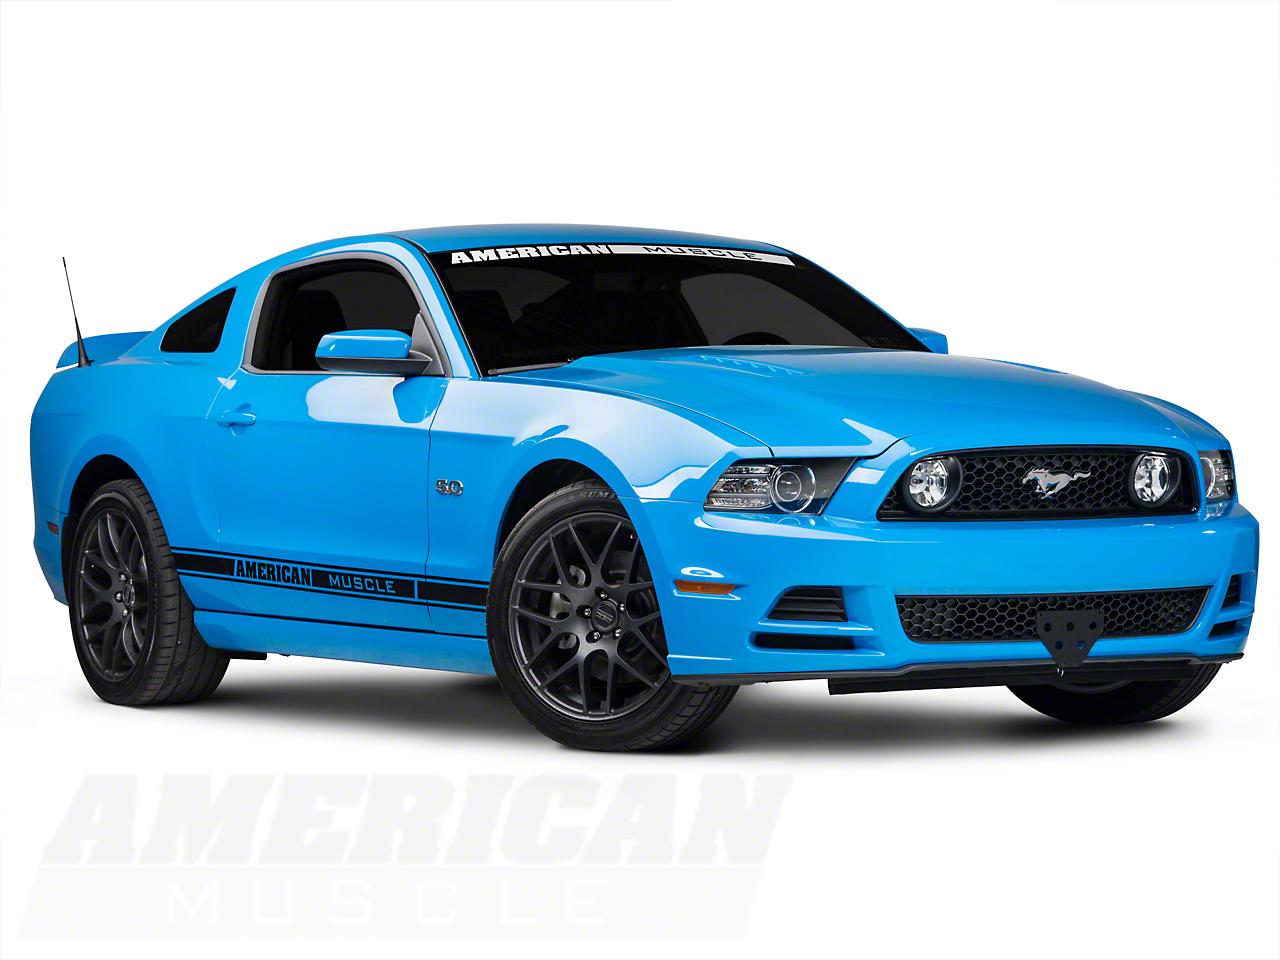 Sto N Sho Detachable Front License Plate Bracket (13-14 GT, V6)